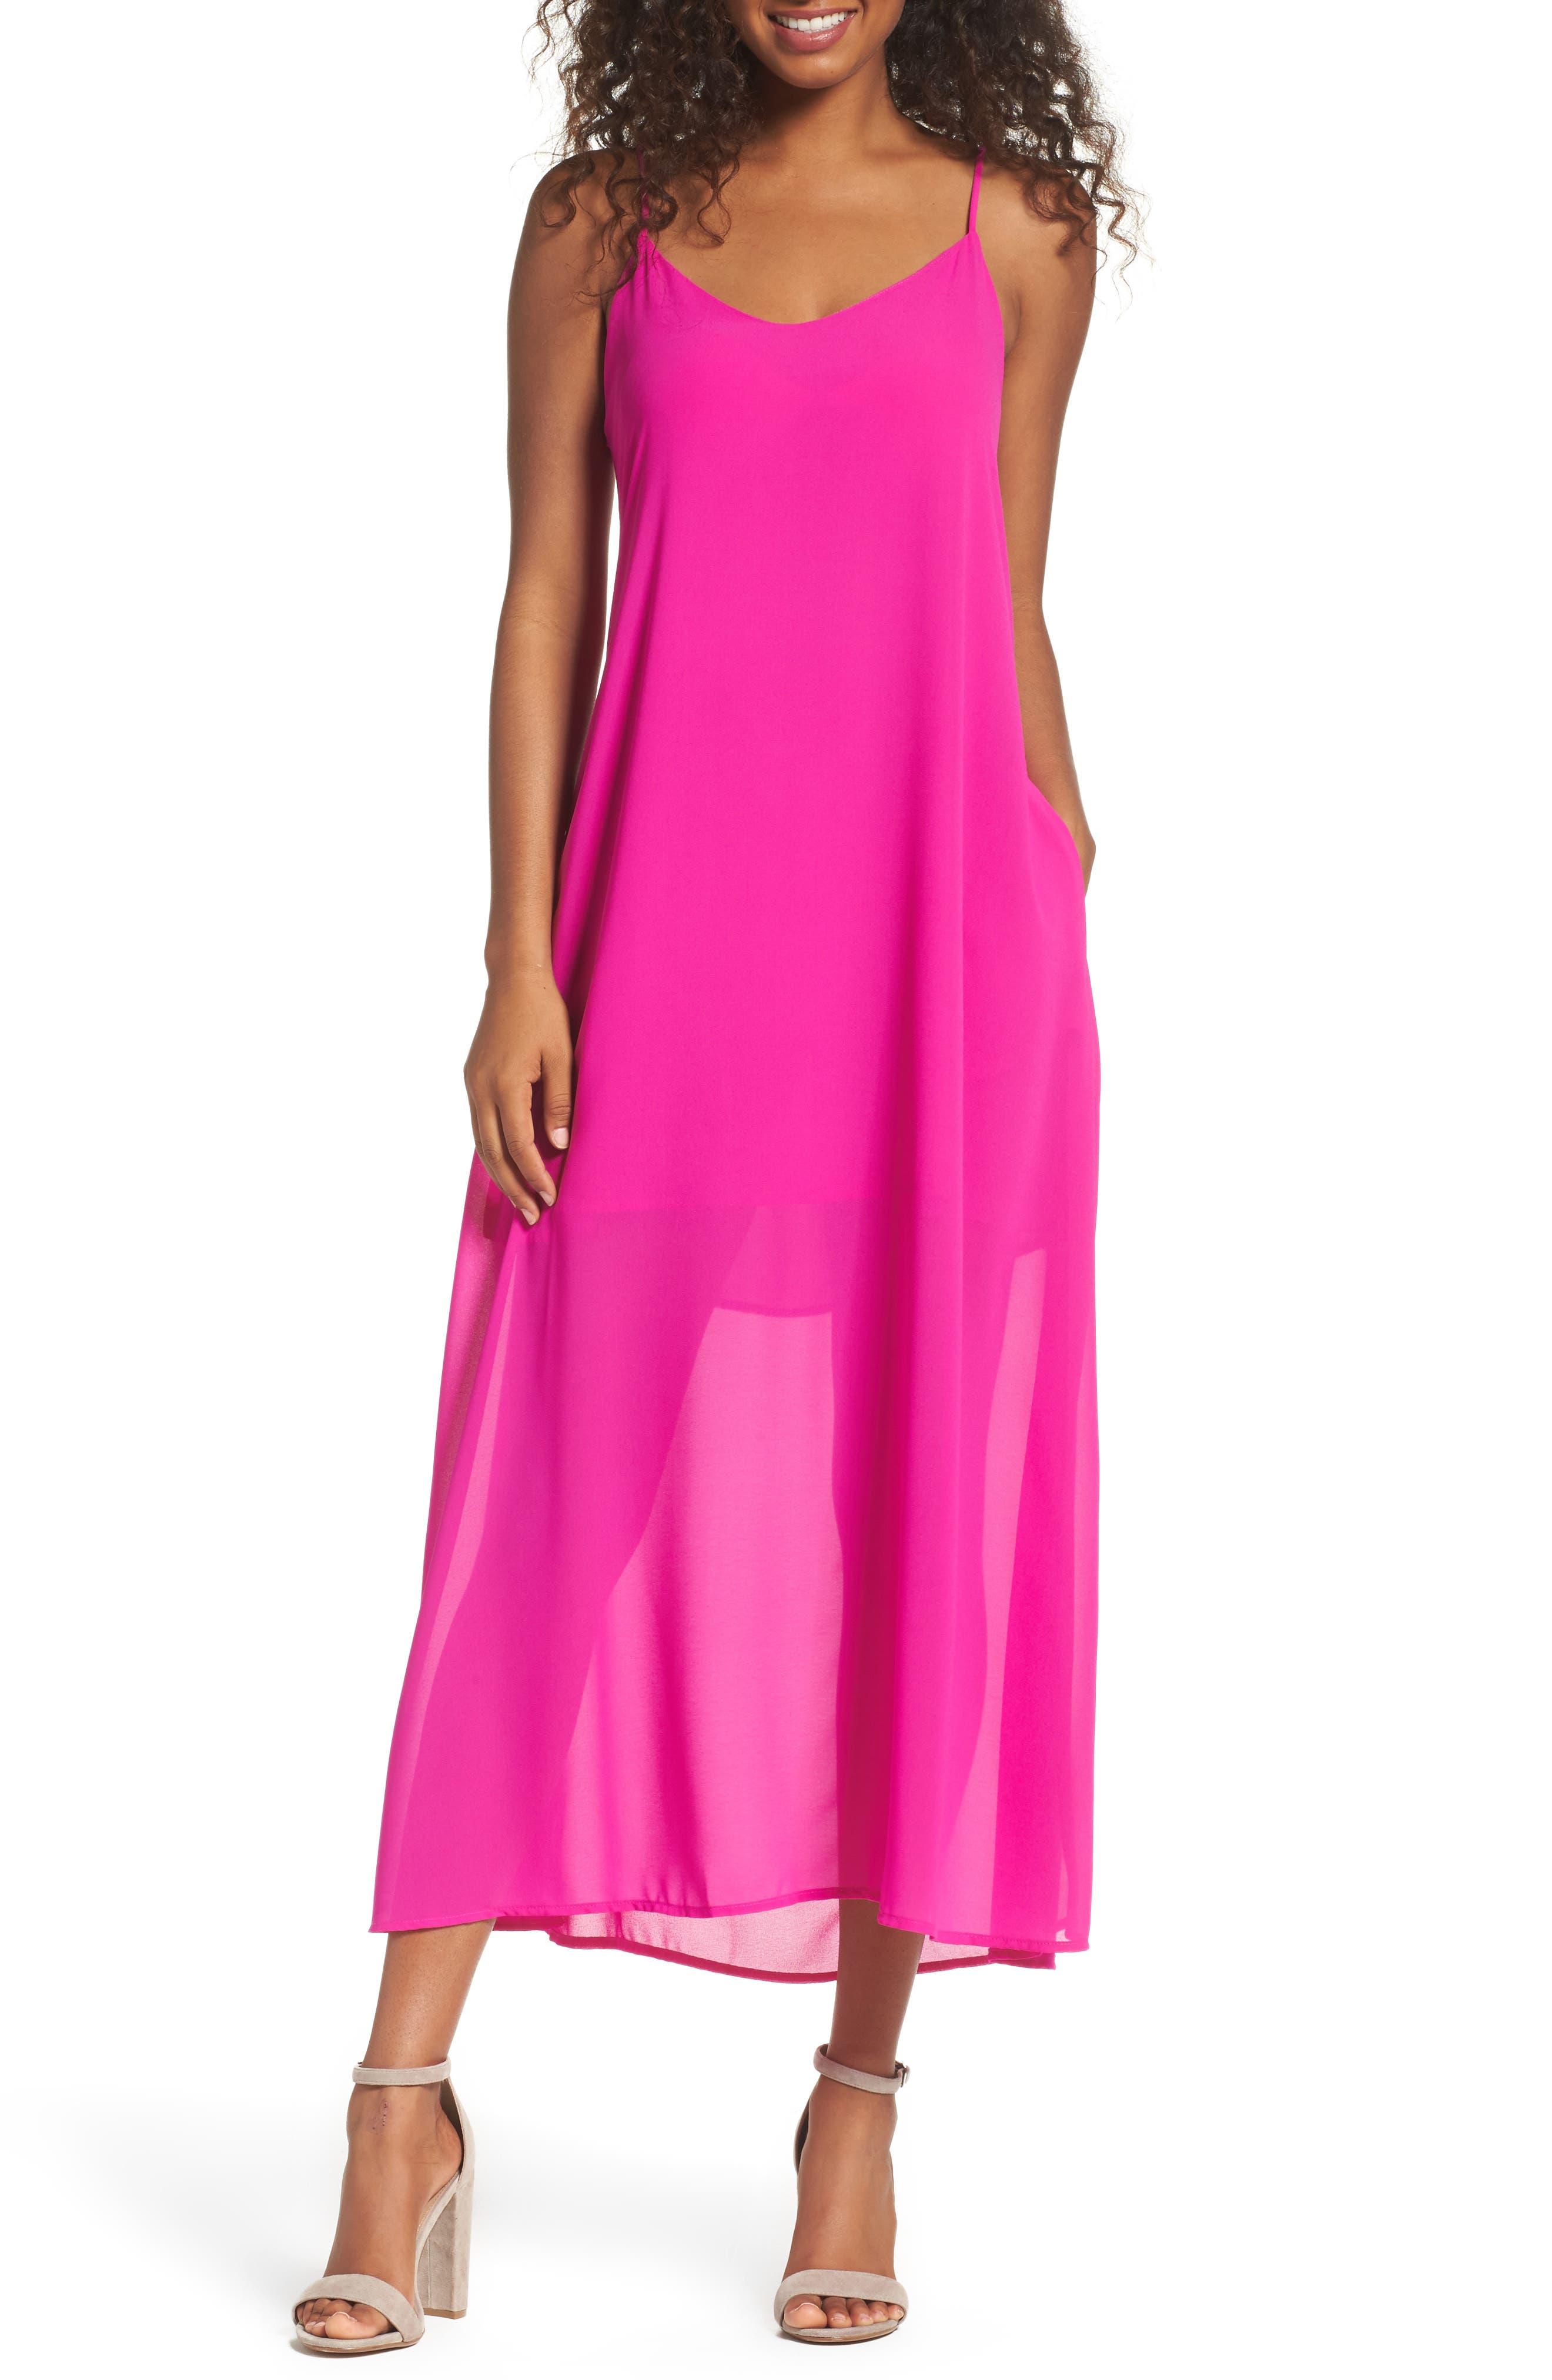 MARY & MABEL Maxi Dress